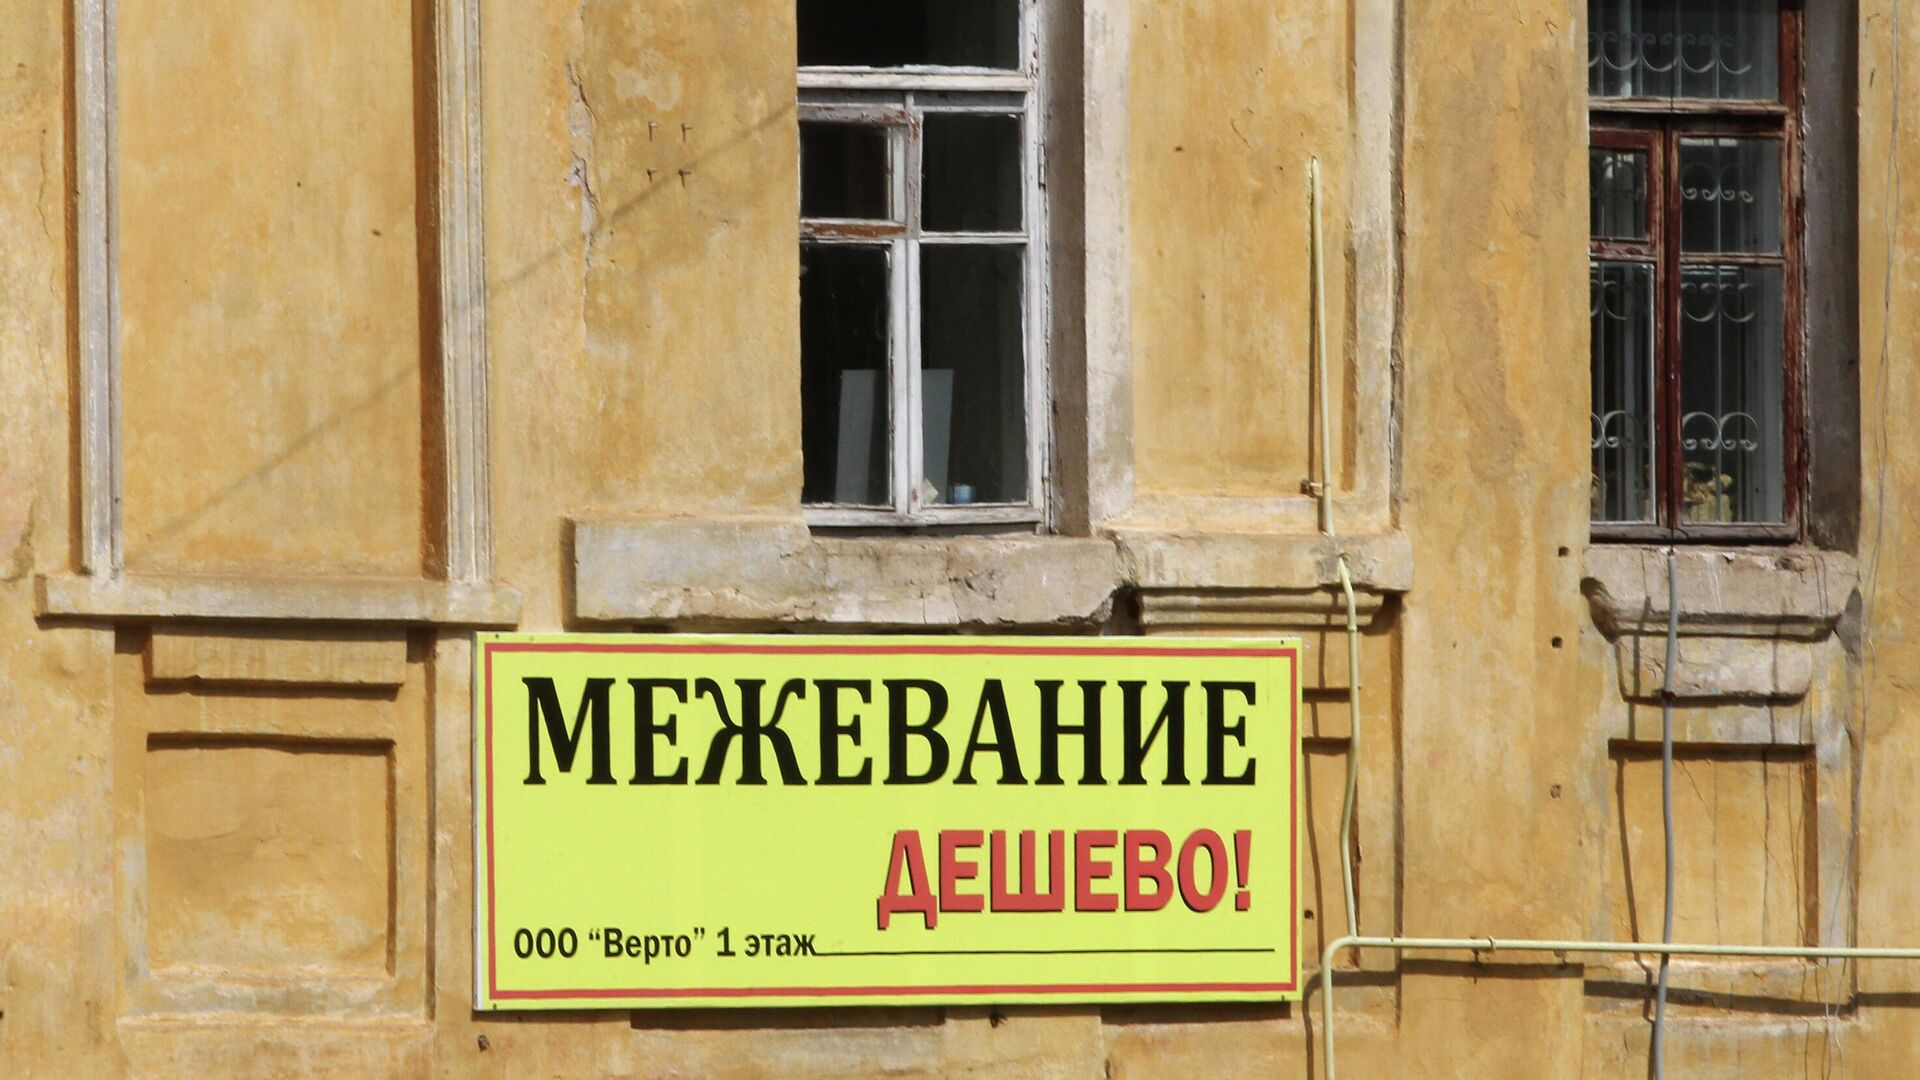 Вывеска на доме - РИА Новости, 1920, 27.07.2021